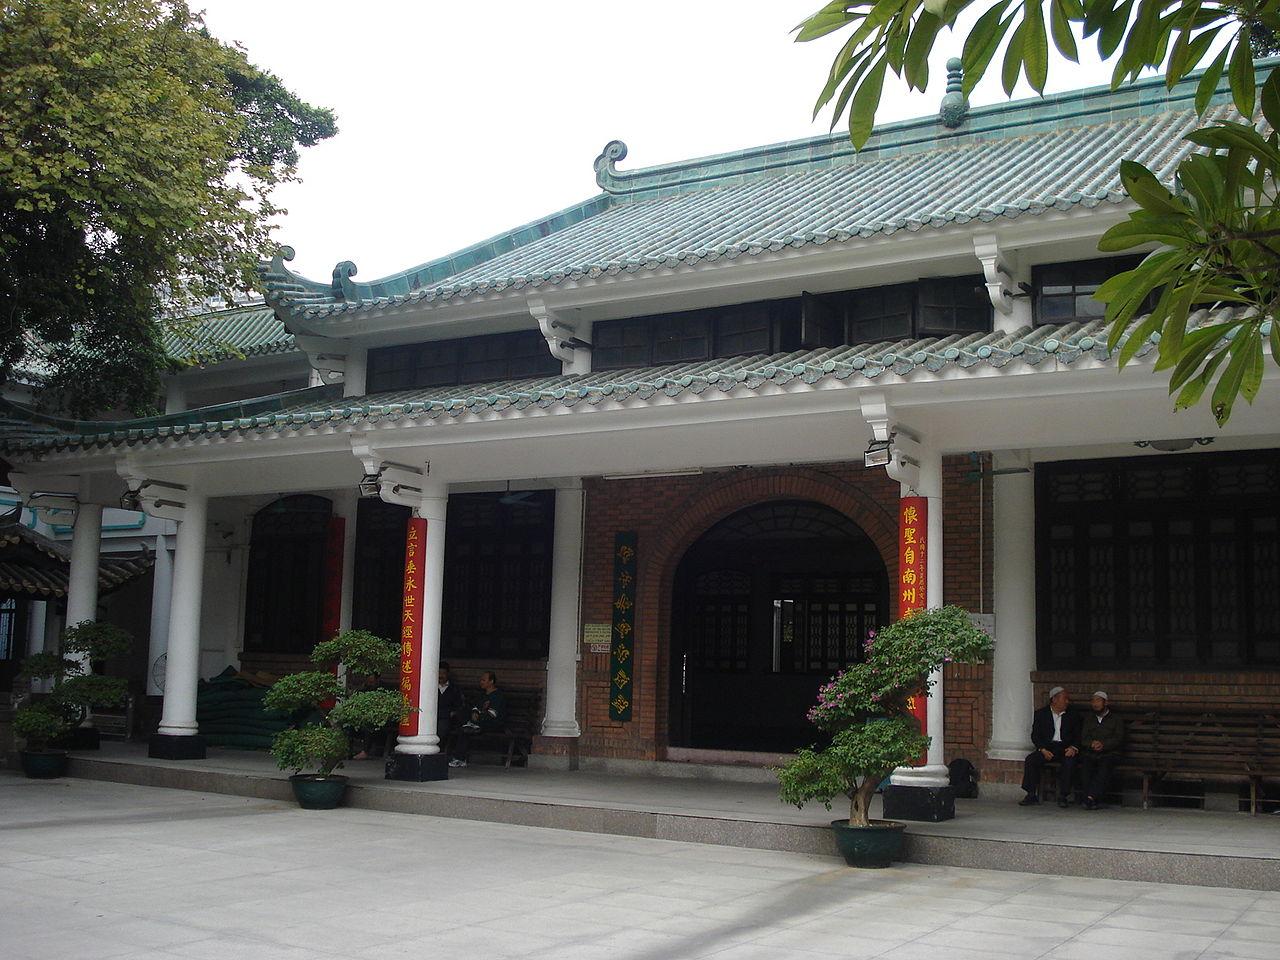 Мечеть Хуайшэн, Гуанчжоу